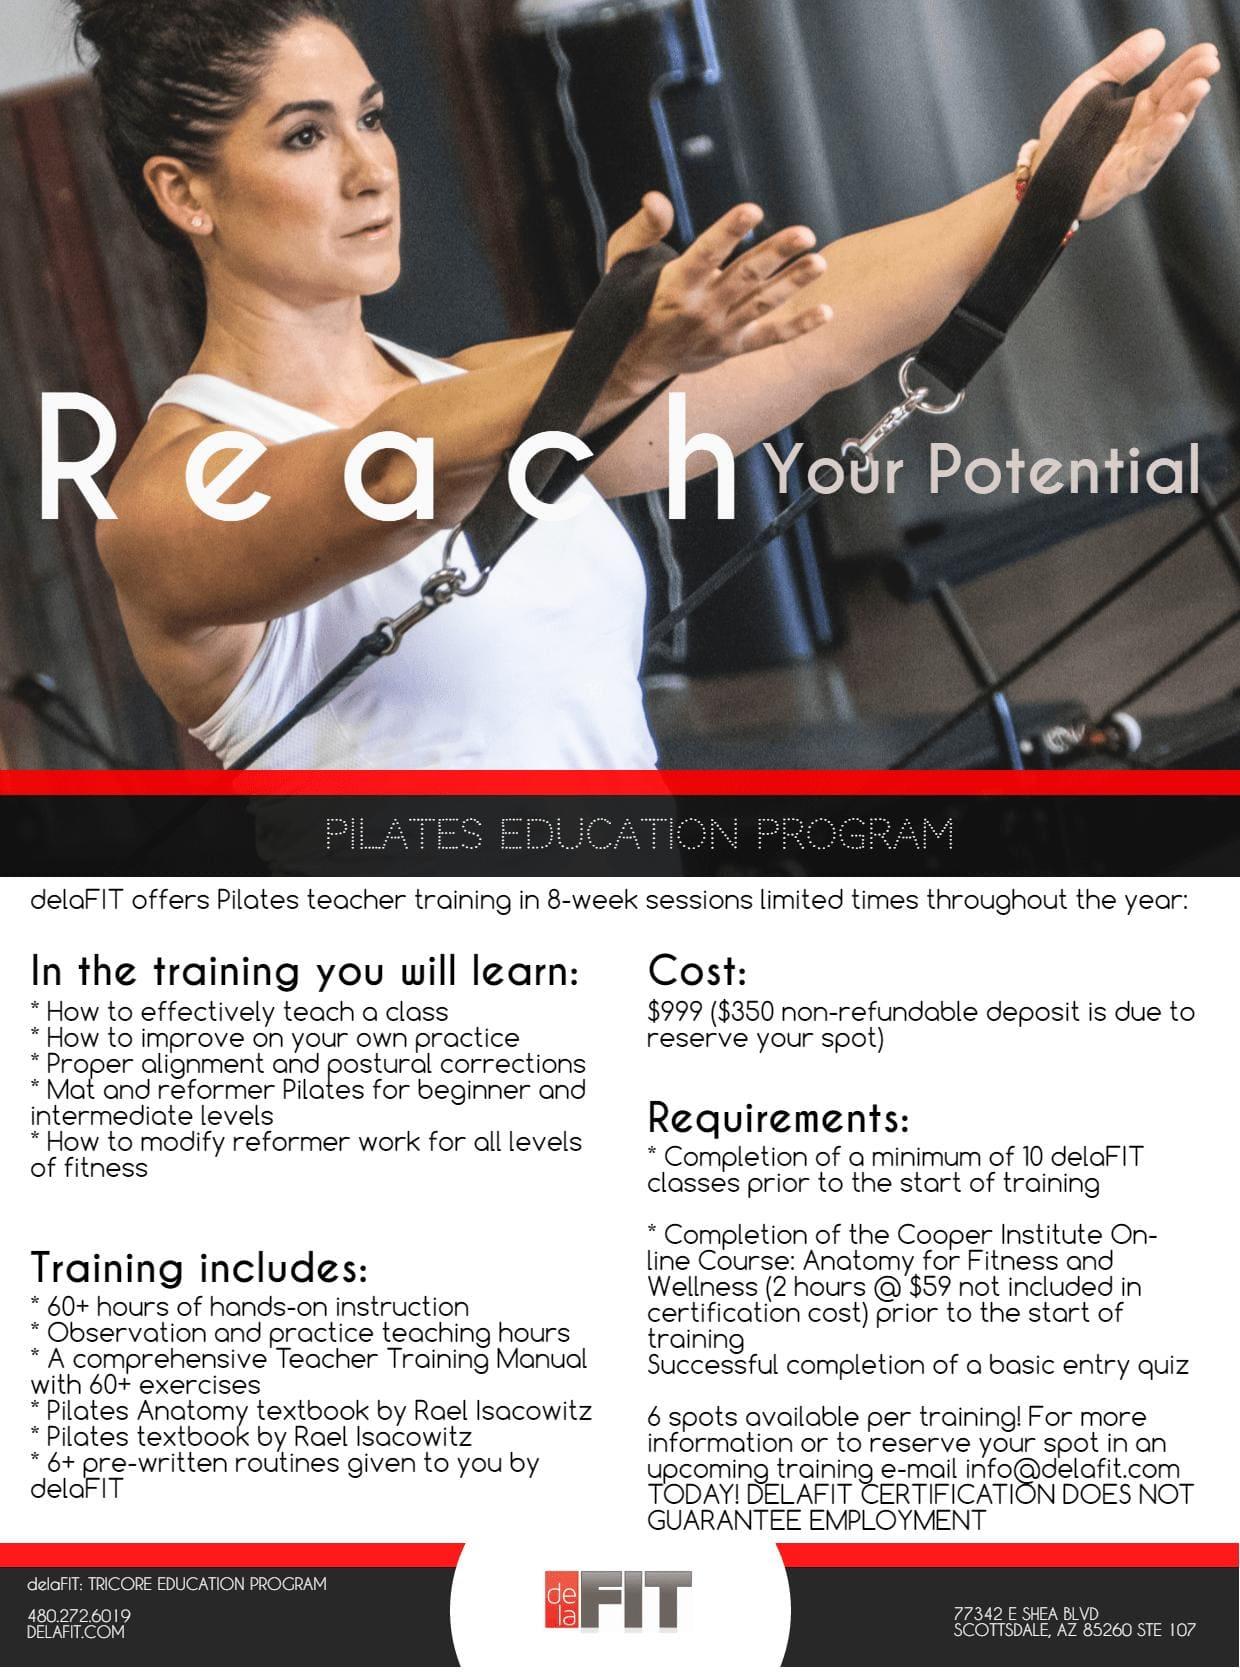 Pilates Education Program in Scottsdale - delaFIT